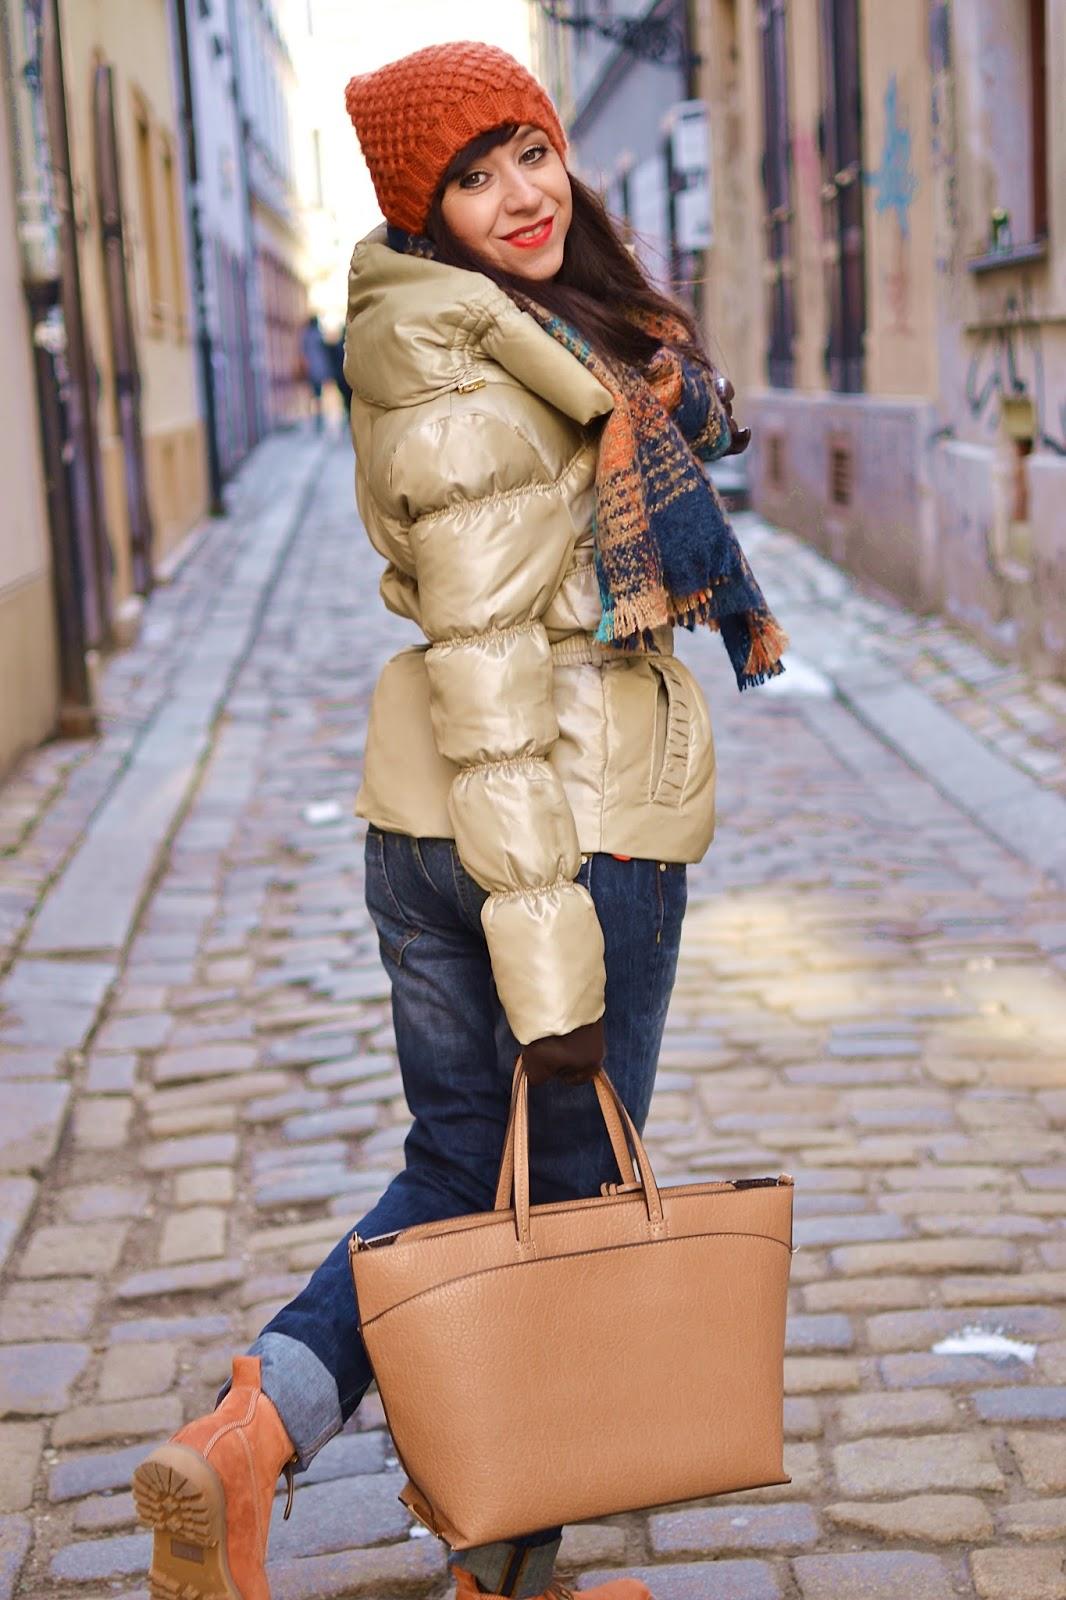 Love ripped boyfriend jeans_Katharine-fashion is beautiful_Roztrhané džínsy_Hnedé kožené rukavice_Oranžové pančuchy_Zlatá bunda_Katarína Jakubčová_Fashion blogger